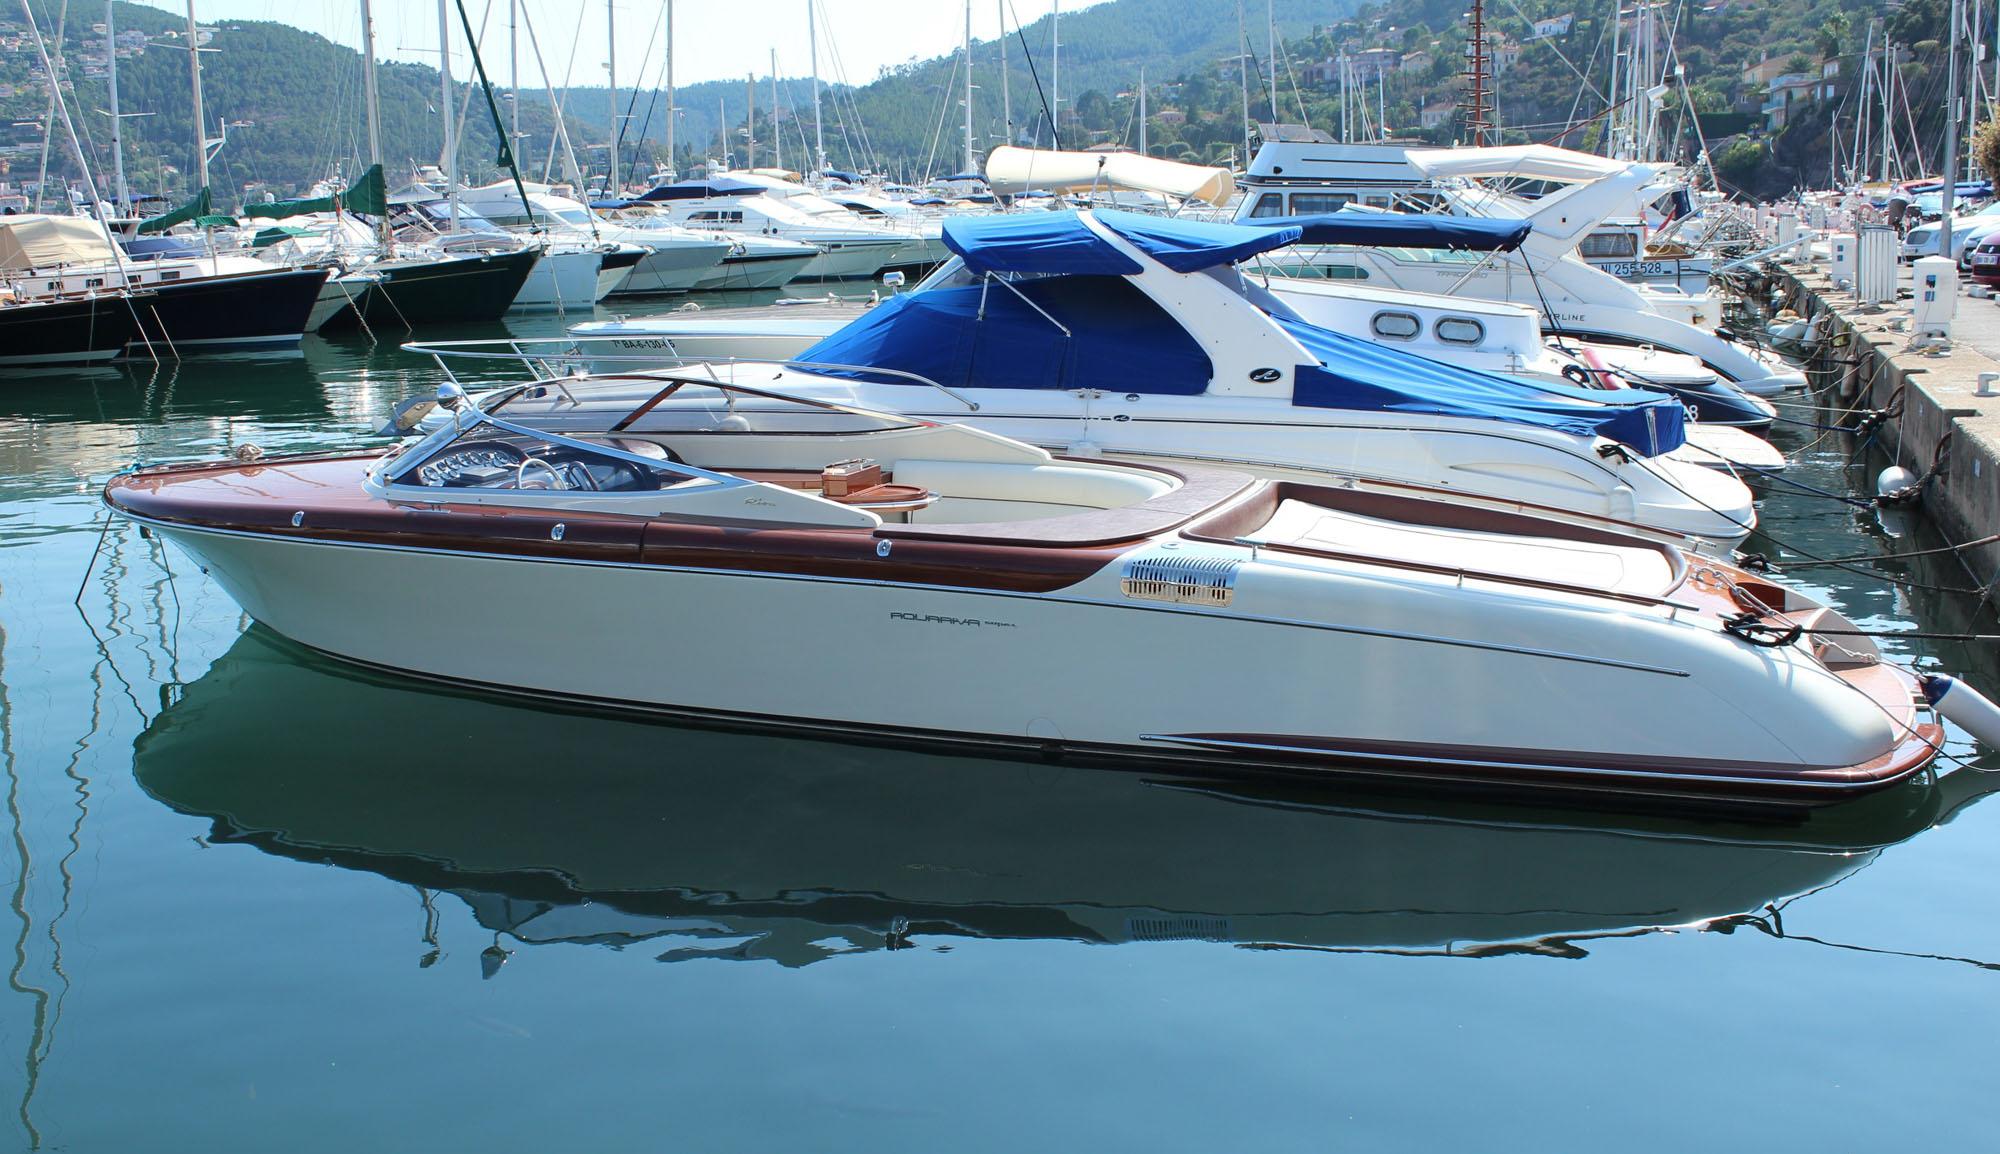 riva aquariva 33 vente bateau yacht occasions mandelieu cannes nice 06. Black Bedroom Furniture Sets. Home Design Ideas